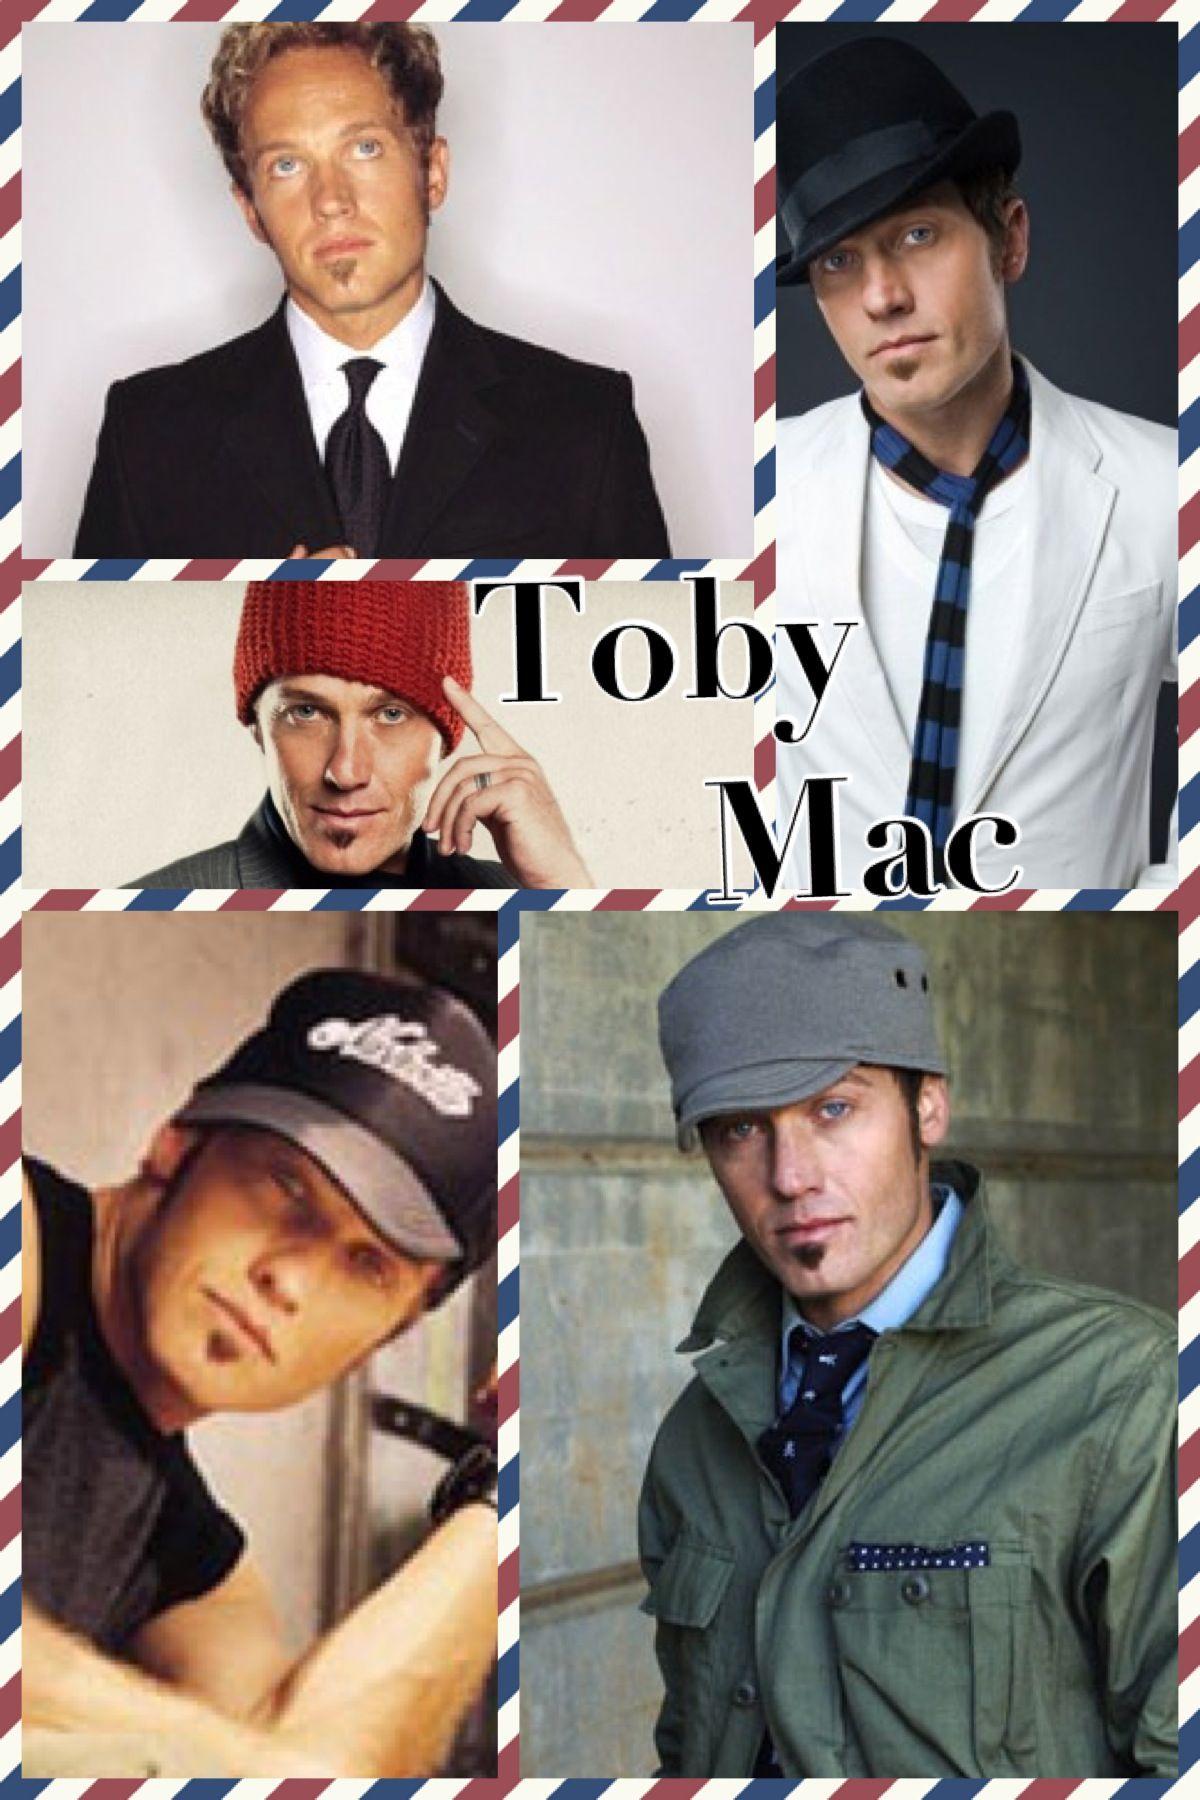 Toby Mac He has been my favorite singer/songwriter since